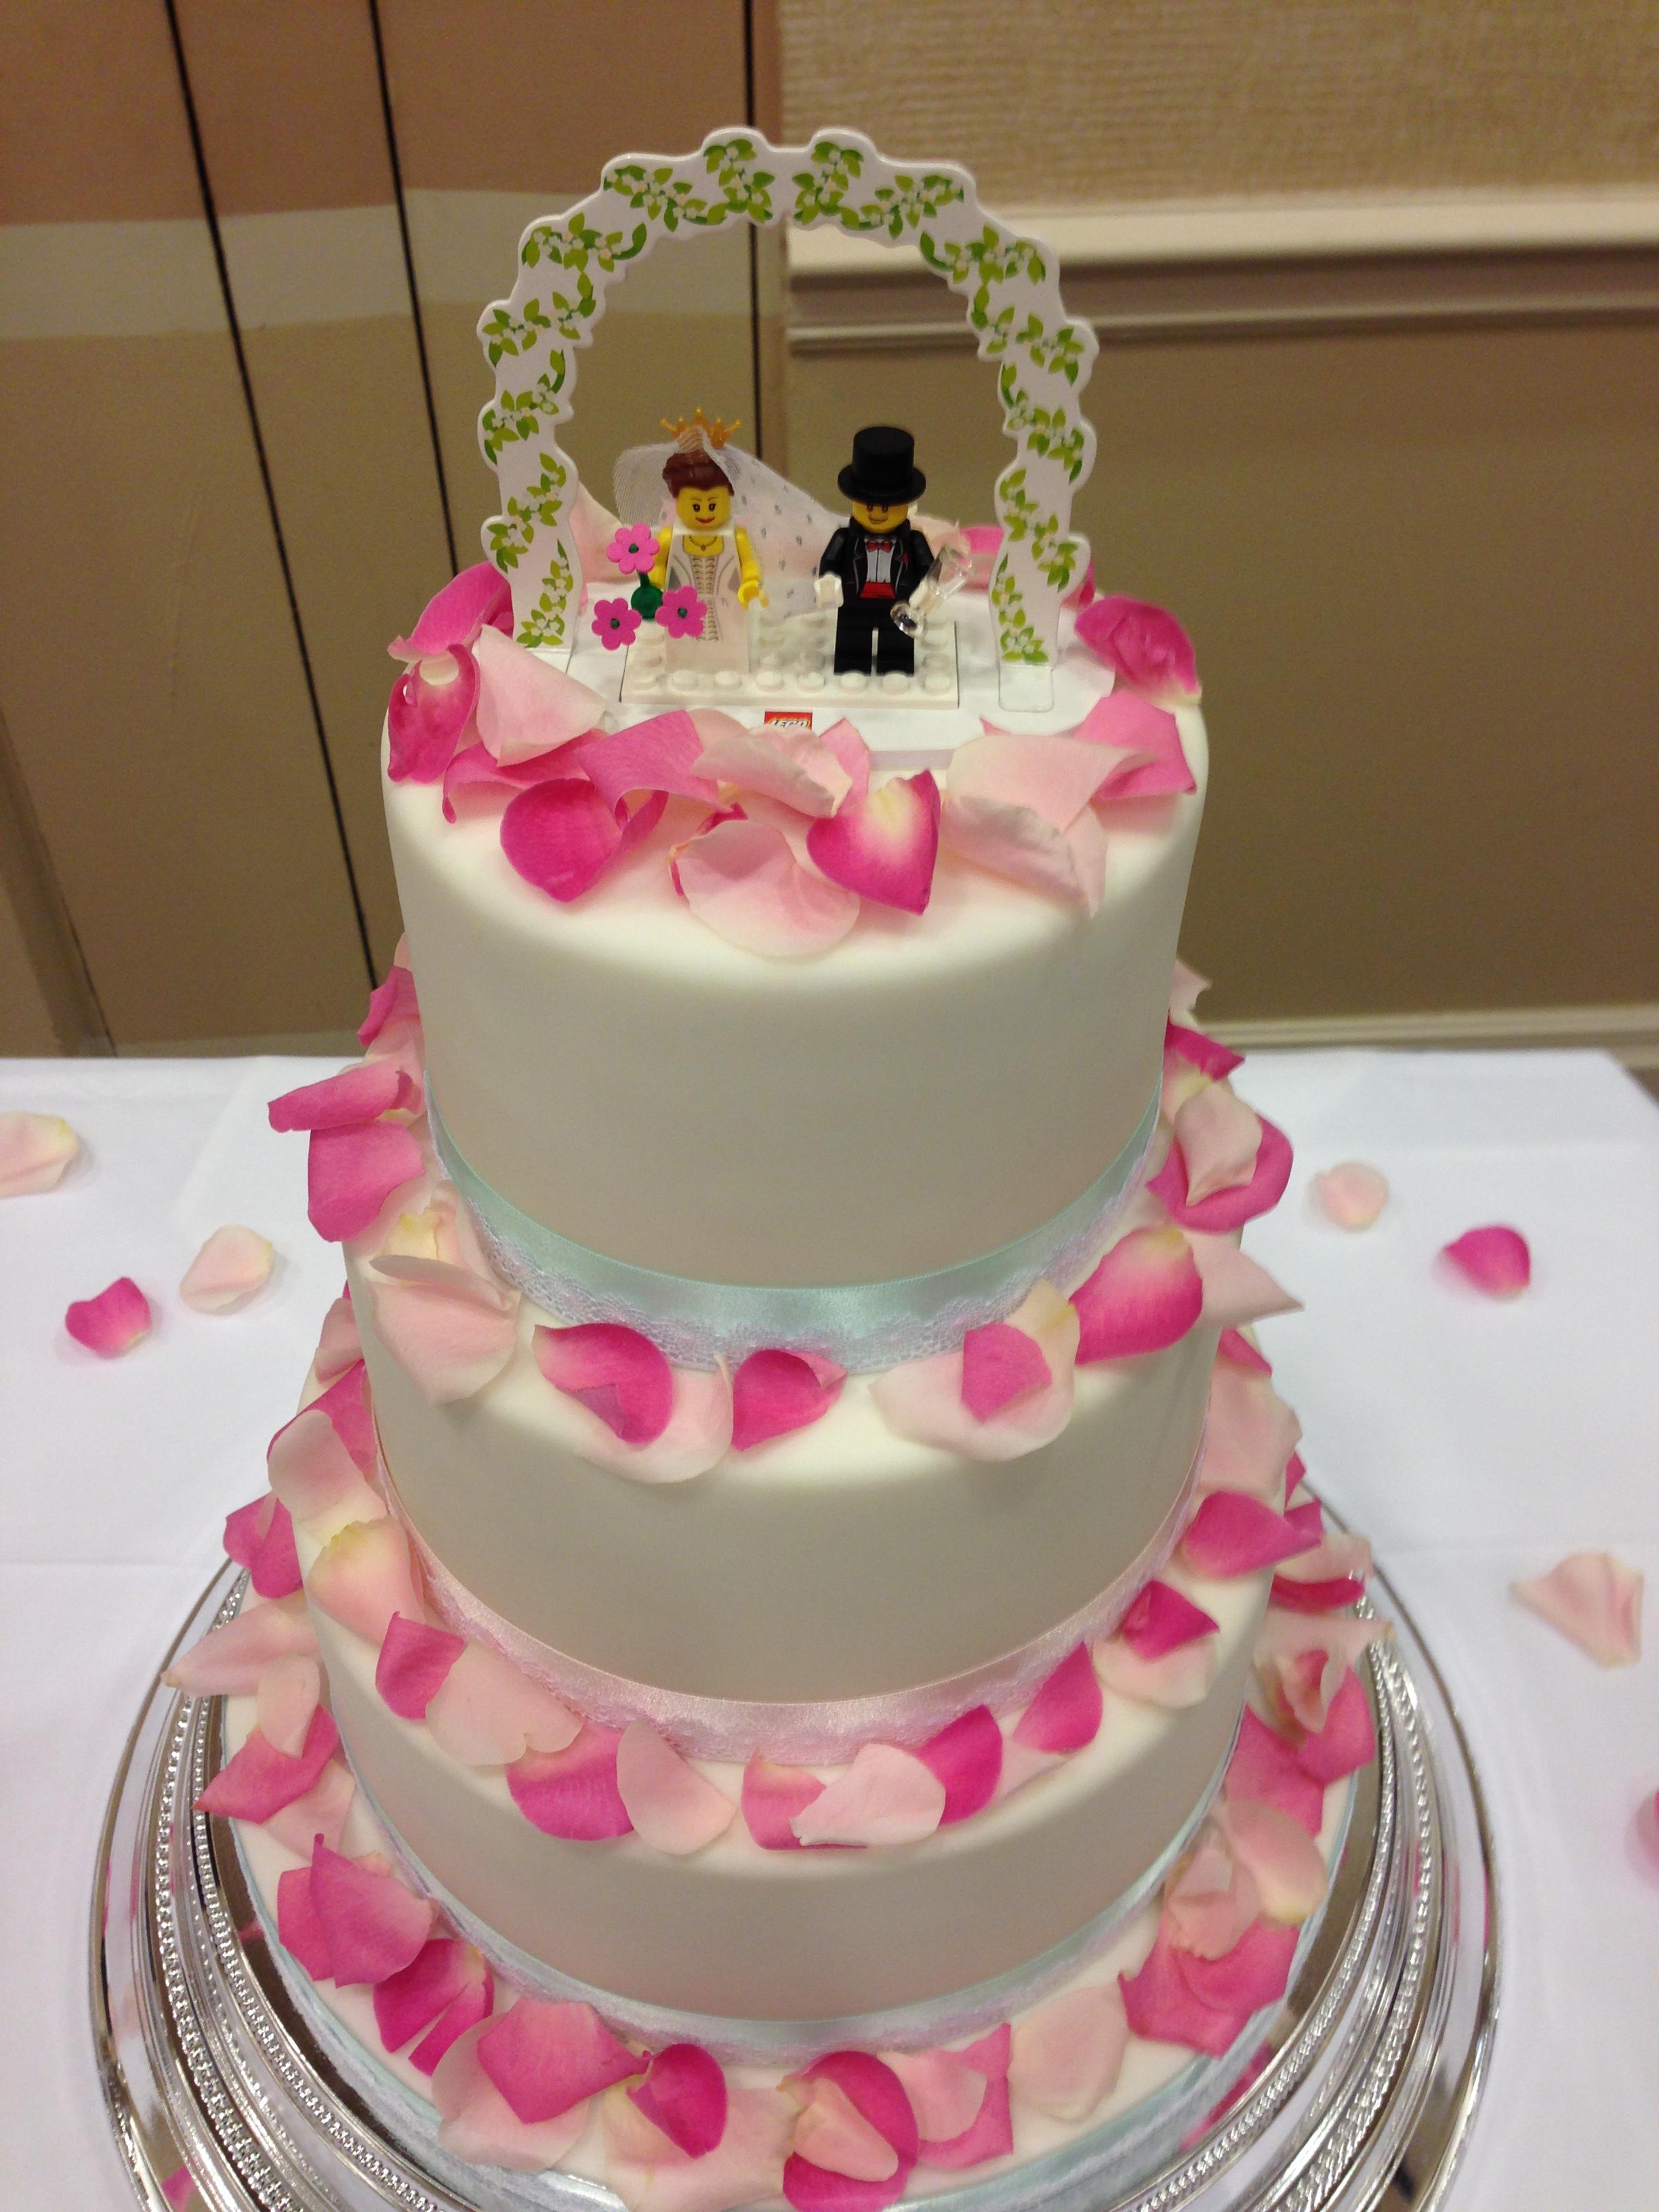 Loren Brand Cakes